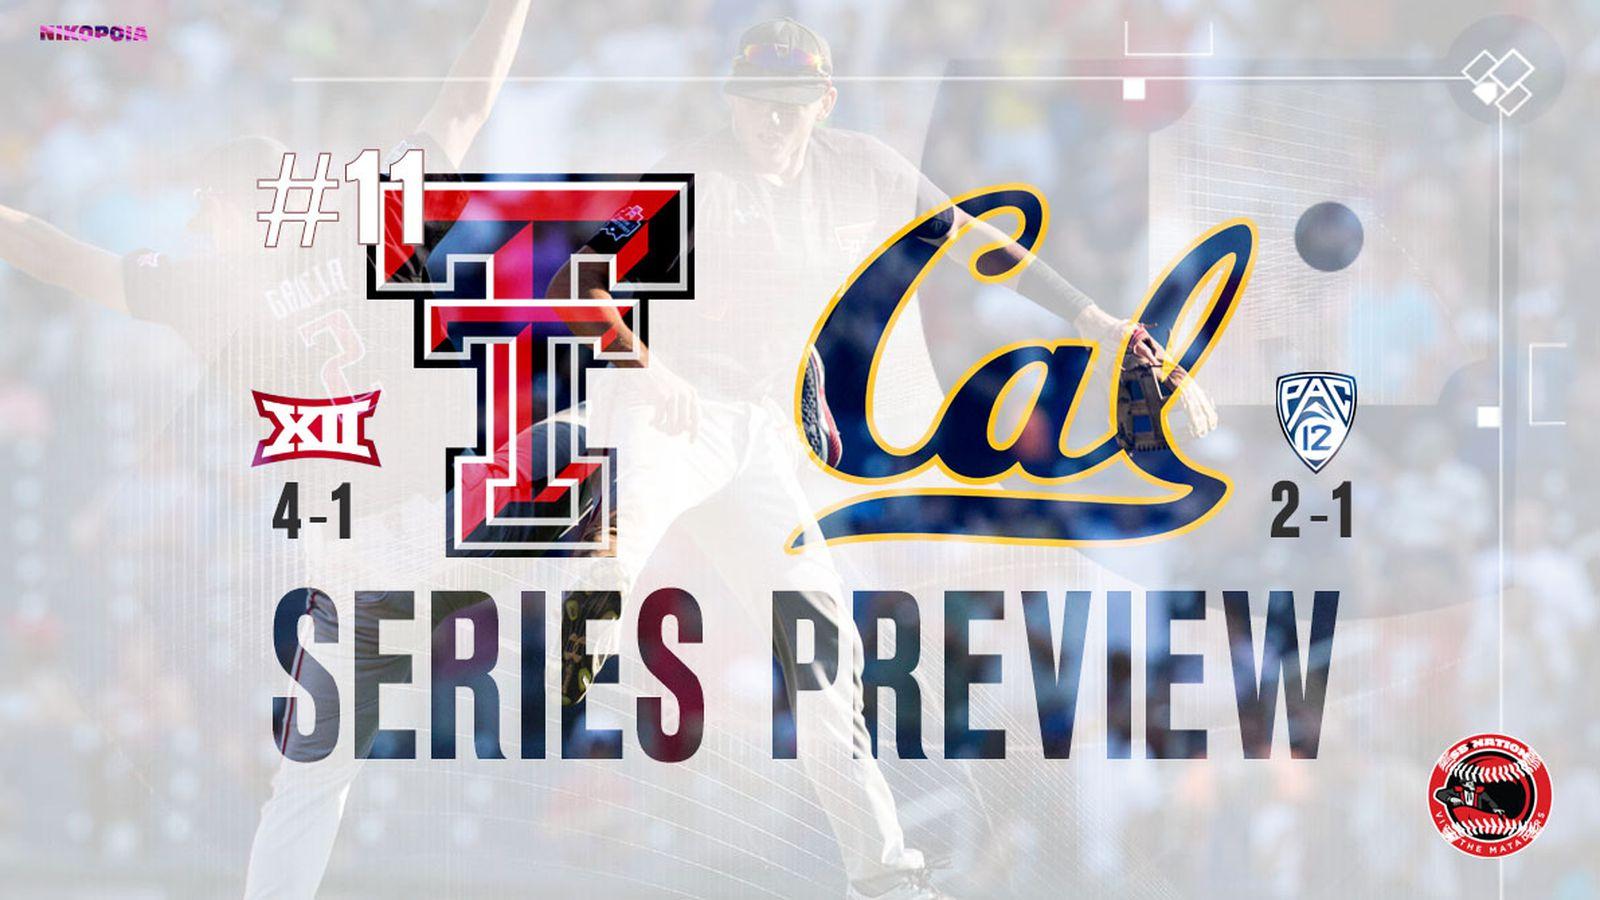 Baseball_preview_cal.0